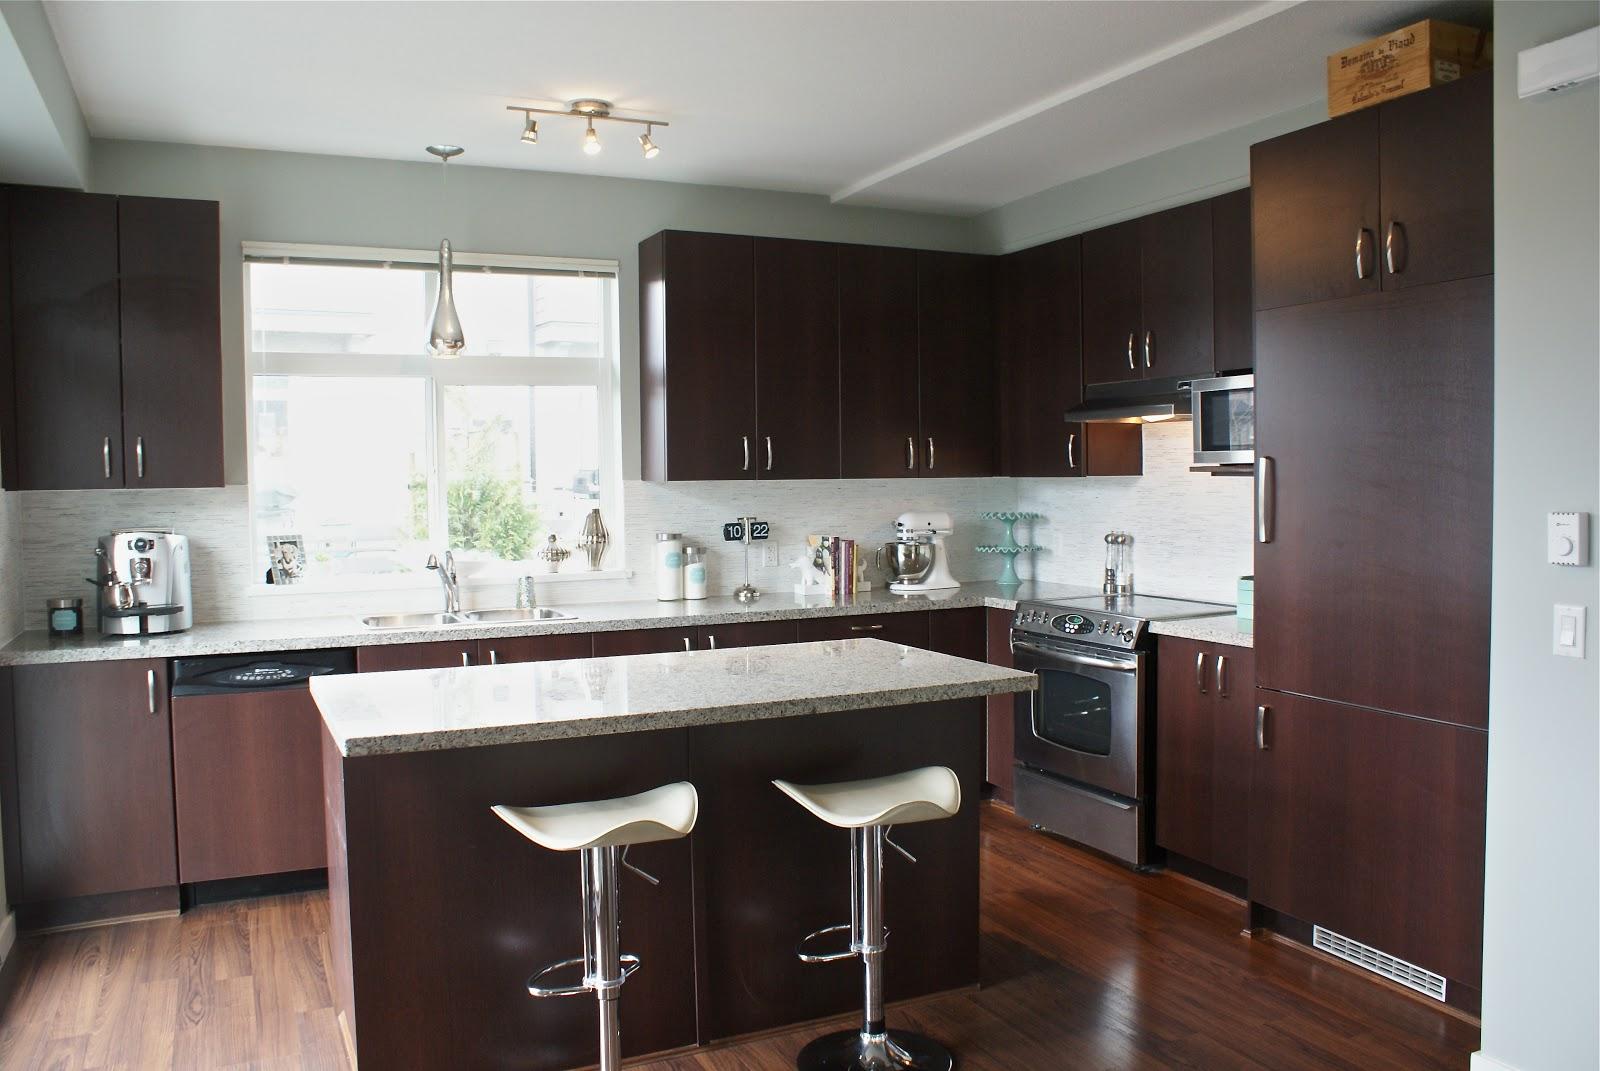 espresso and white kitchen cabinets themed decor our carrara marble backsplash tour